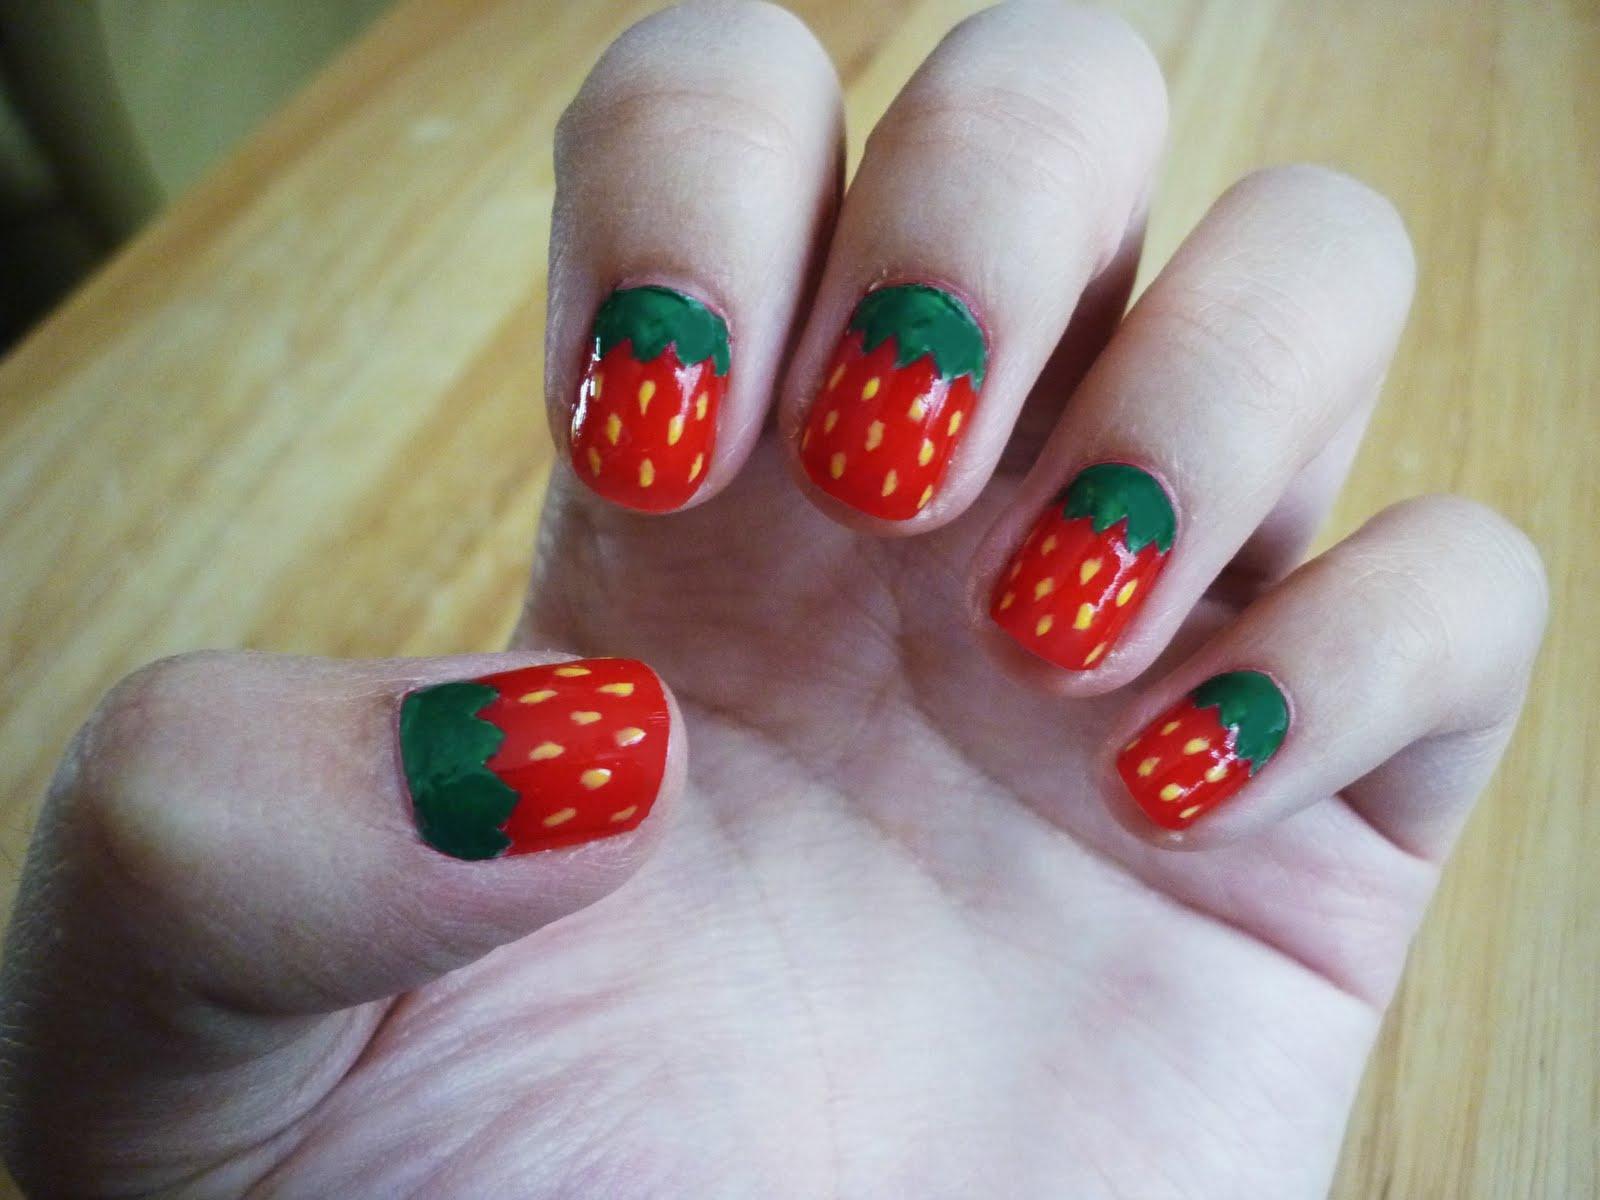 Diseño de uñas de fresa: